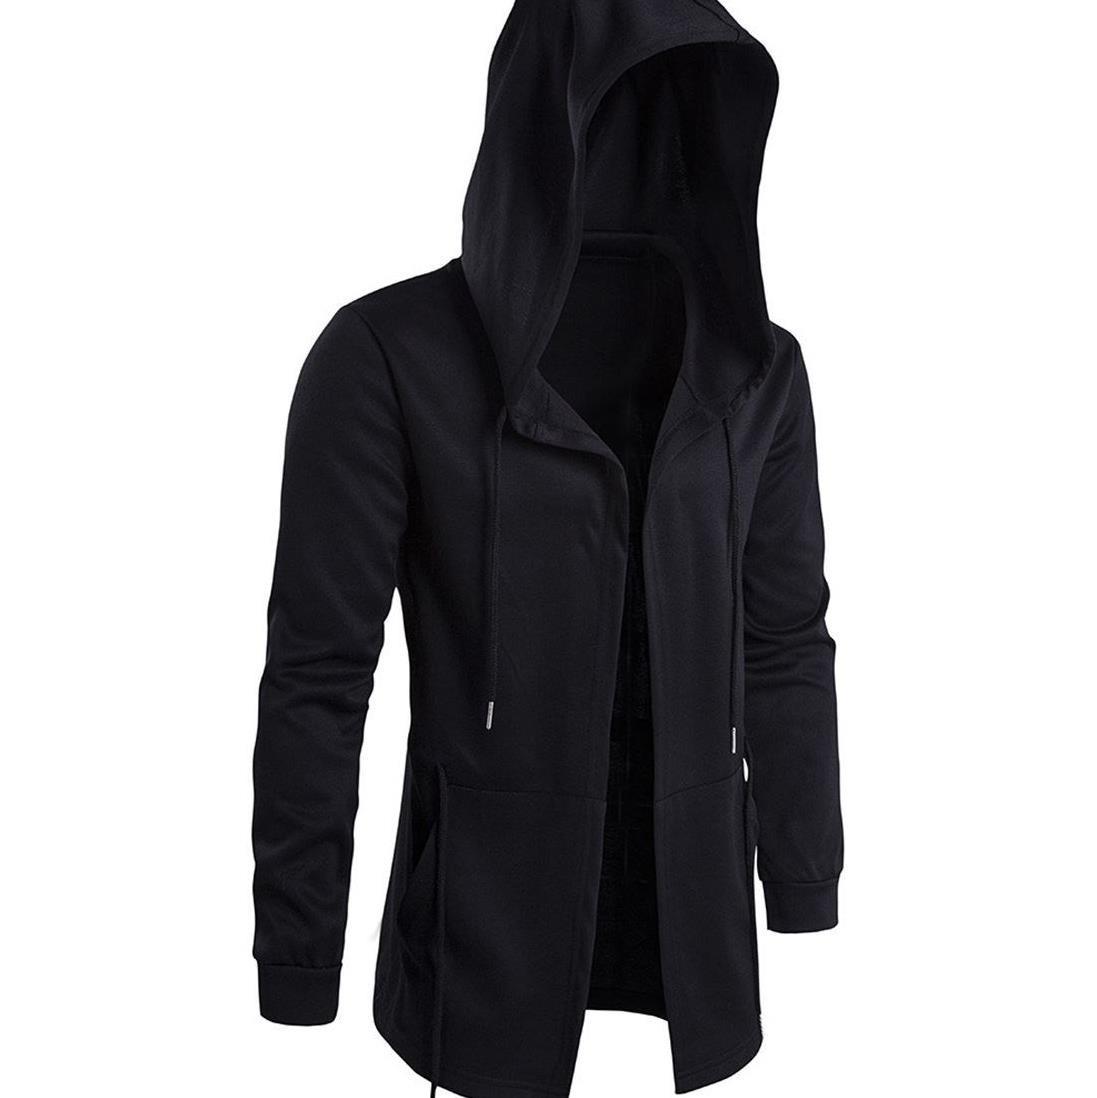 Mens windbreaker mens medium length Cape wizards Cape Hooded Coat mens jacket